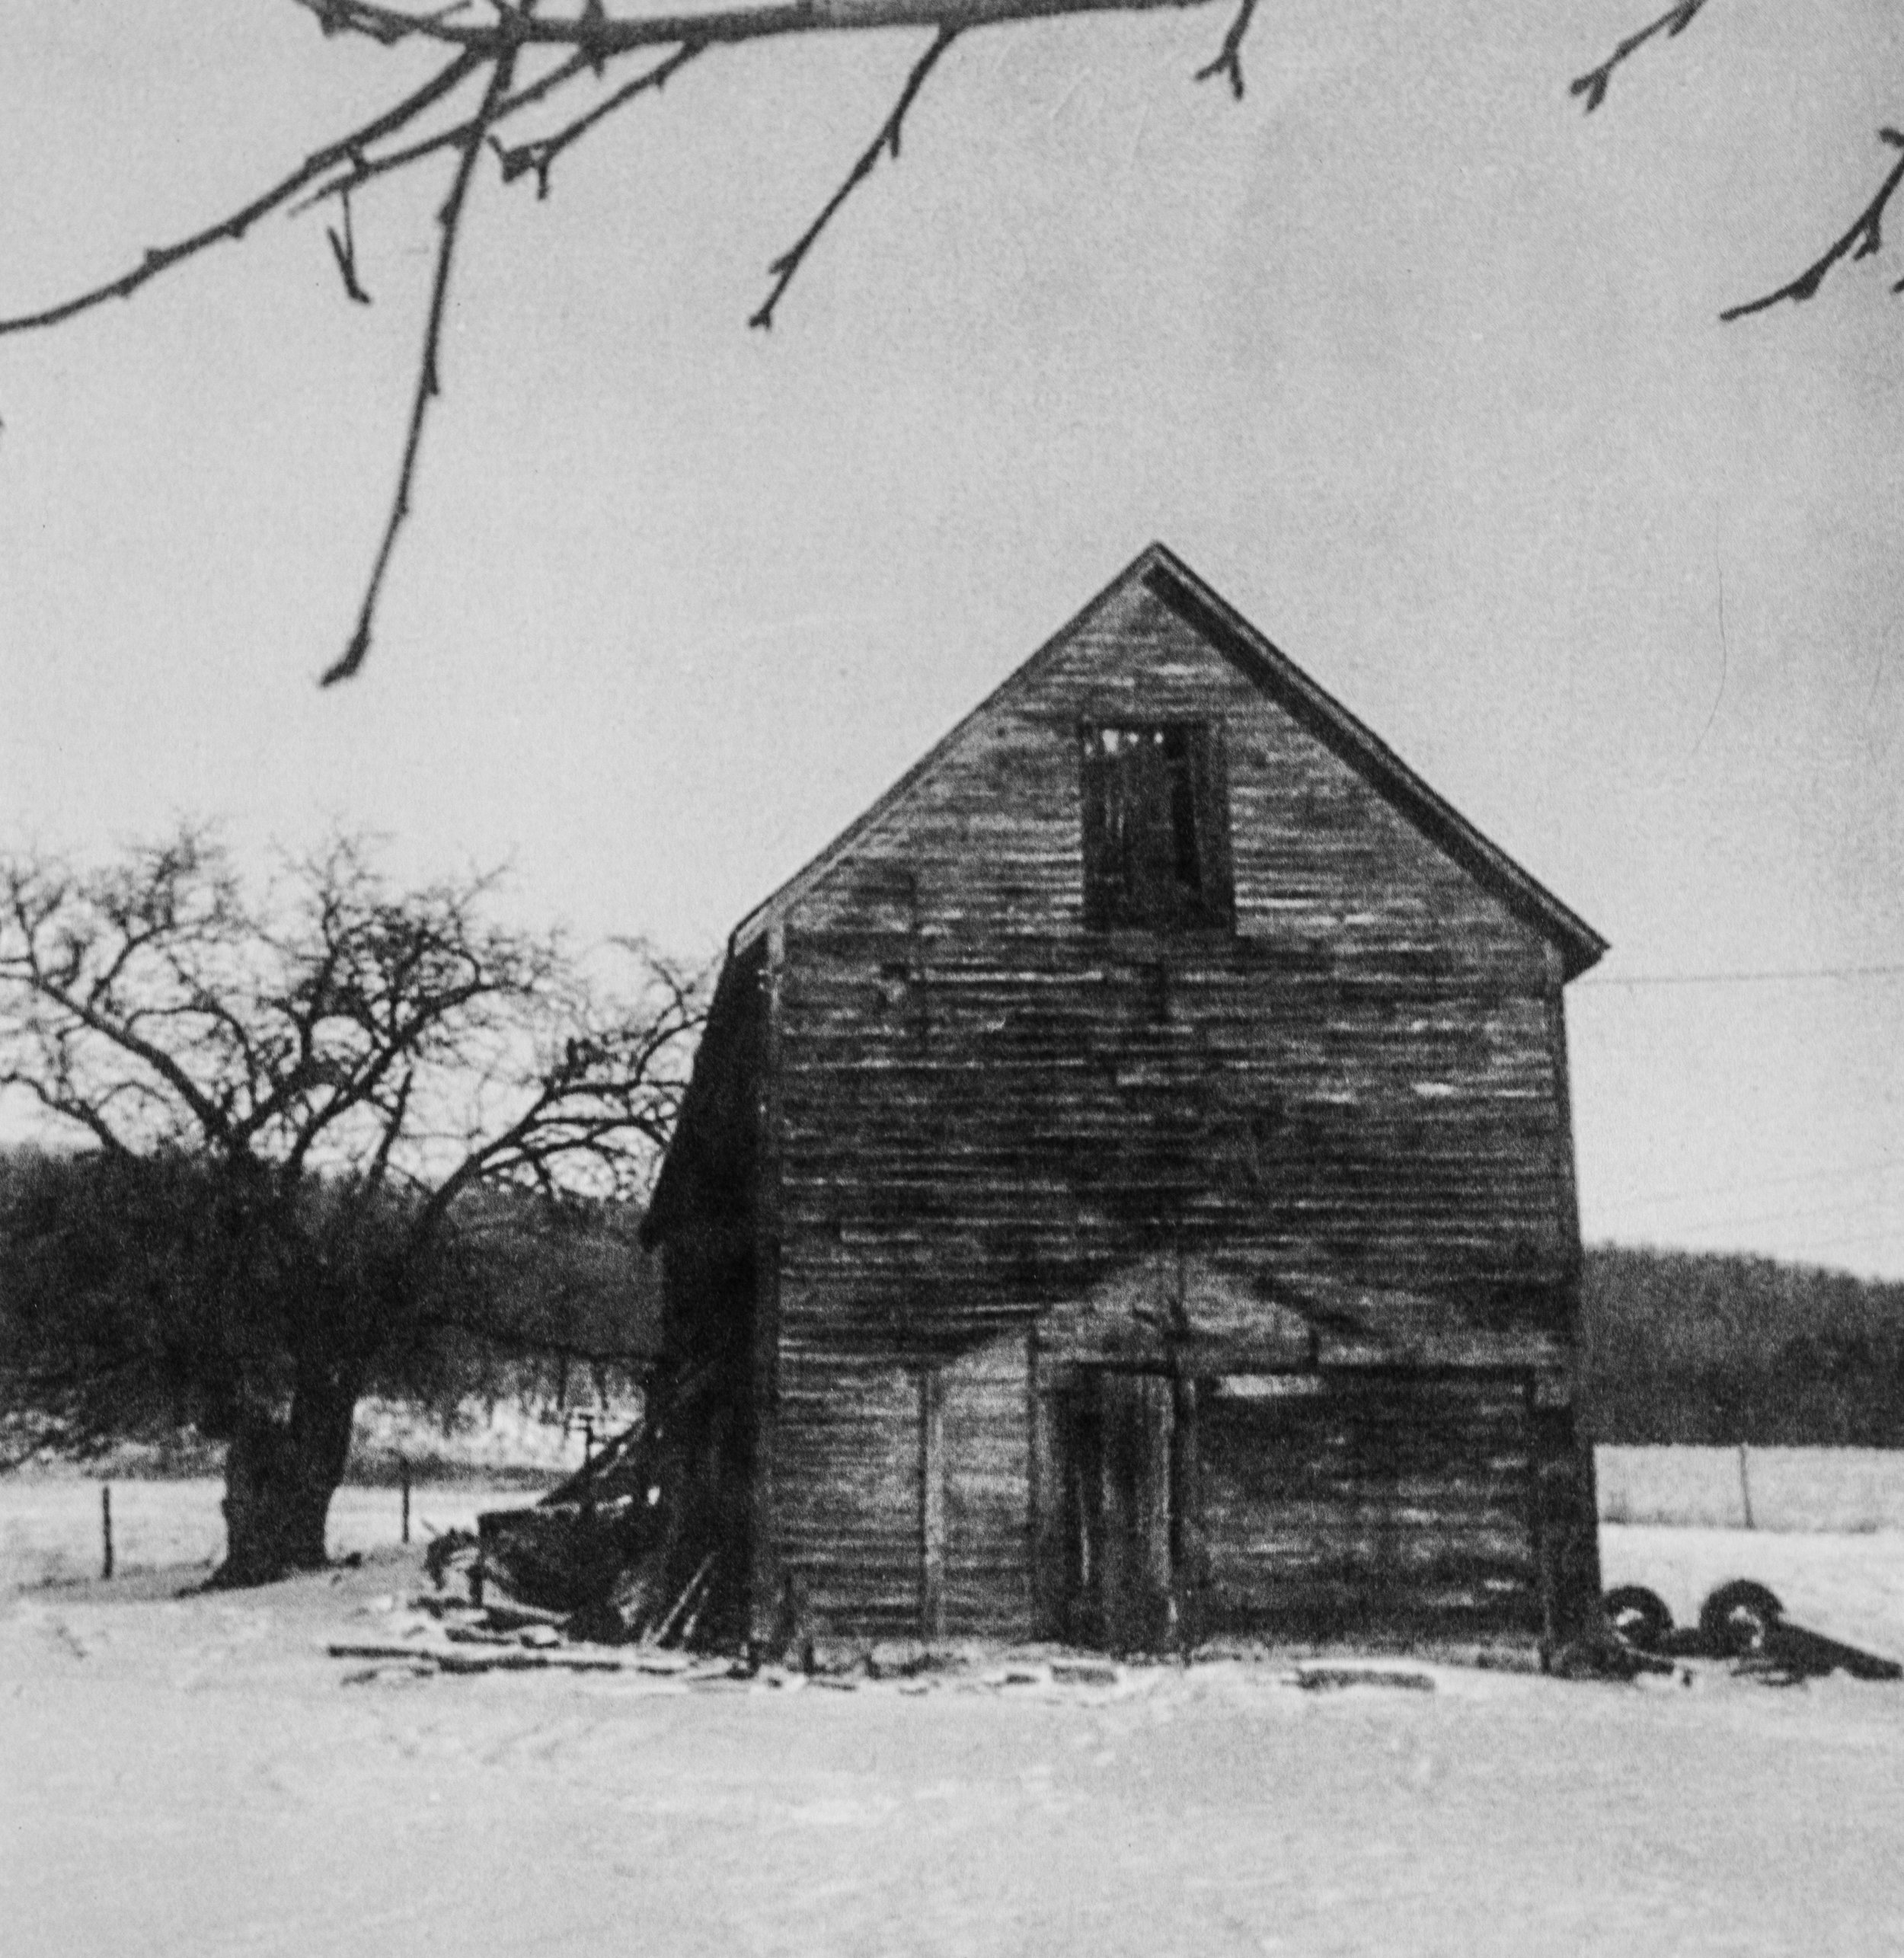 Oldest apple storage - built in 1880s.